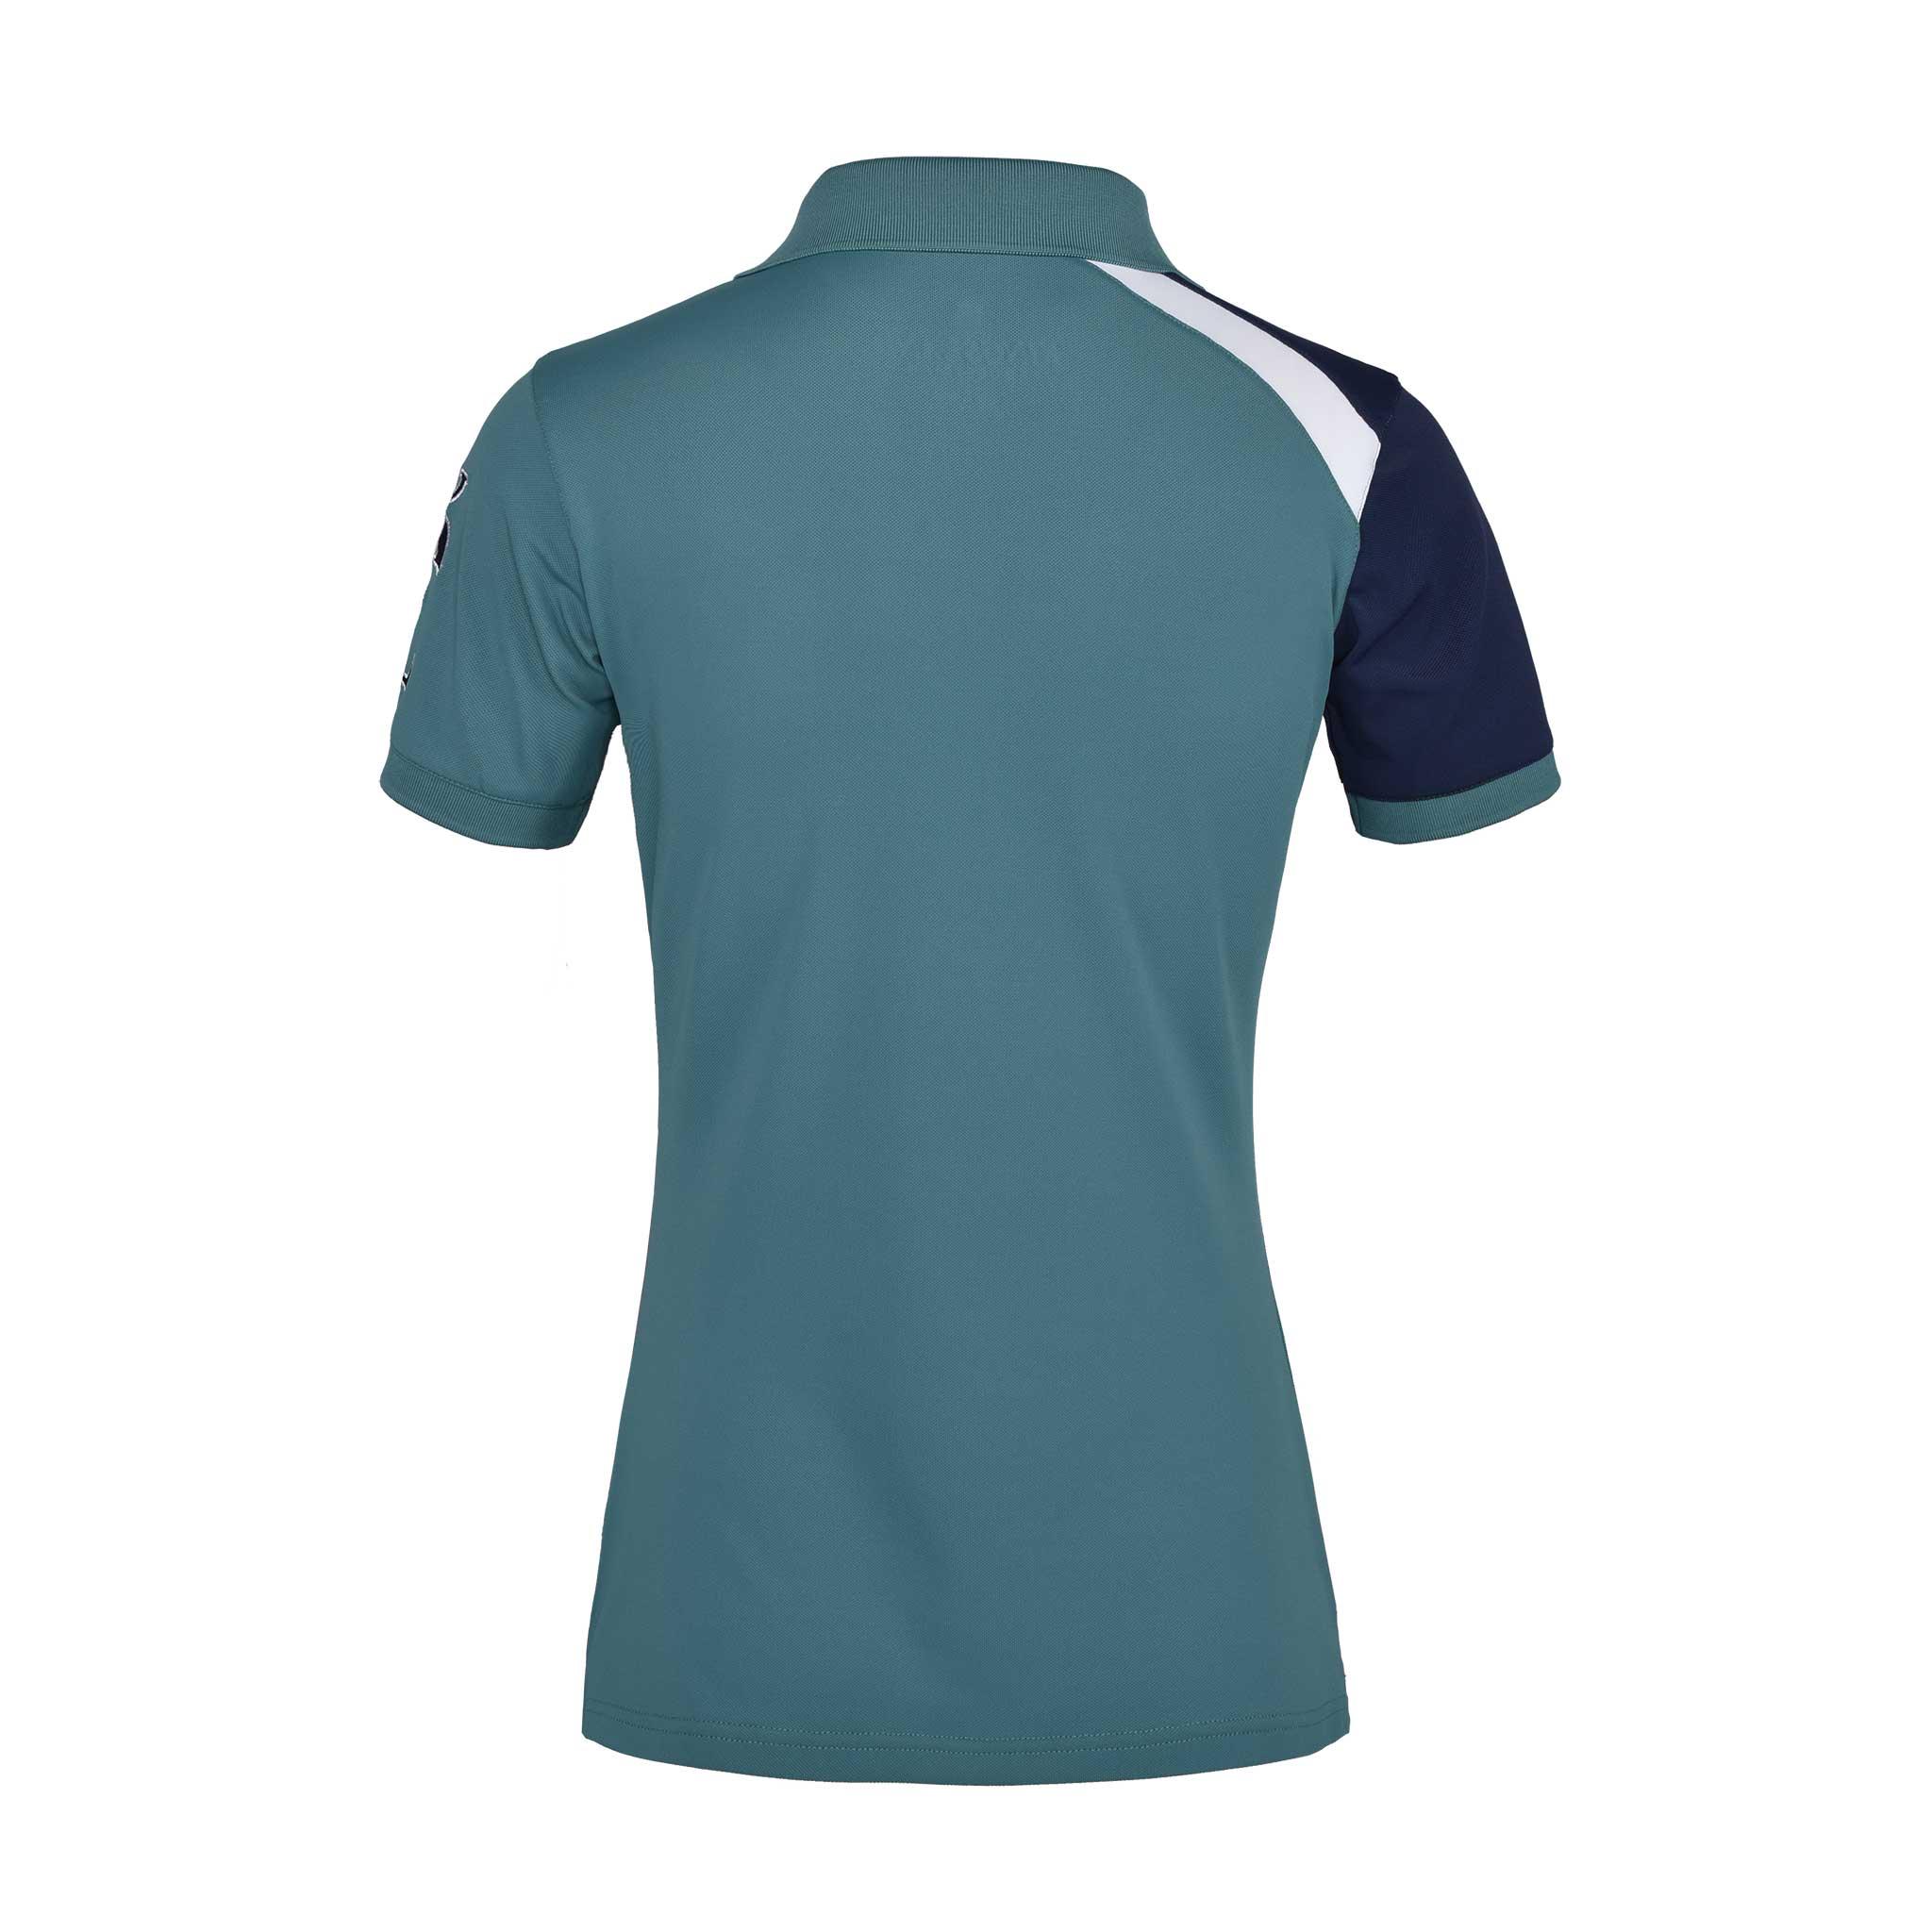 Kingsland KLiezabel Poloshirt Damen